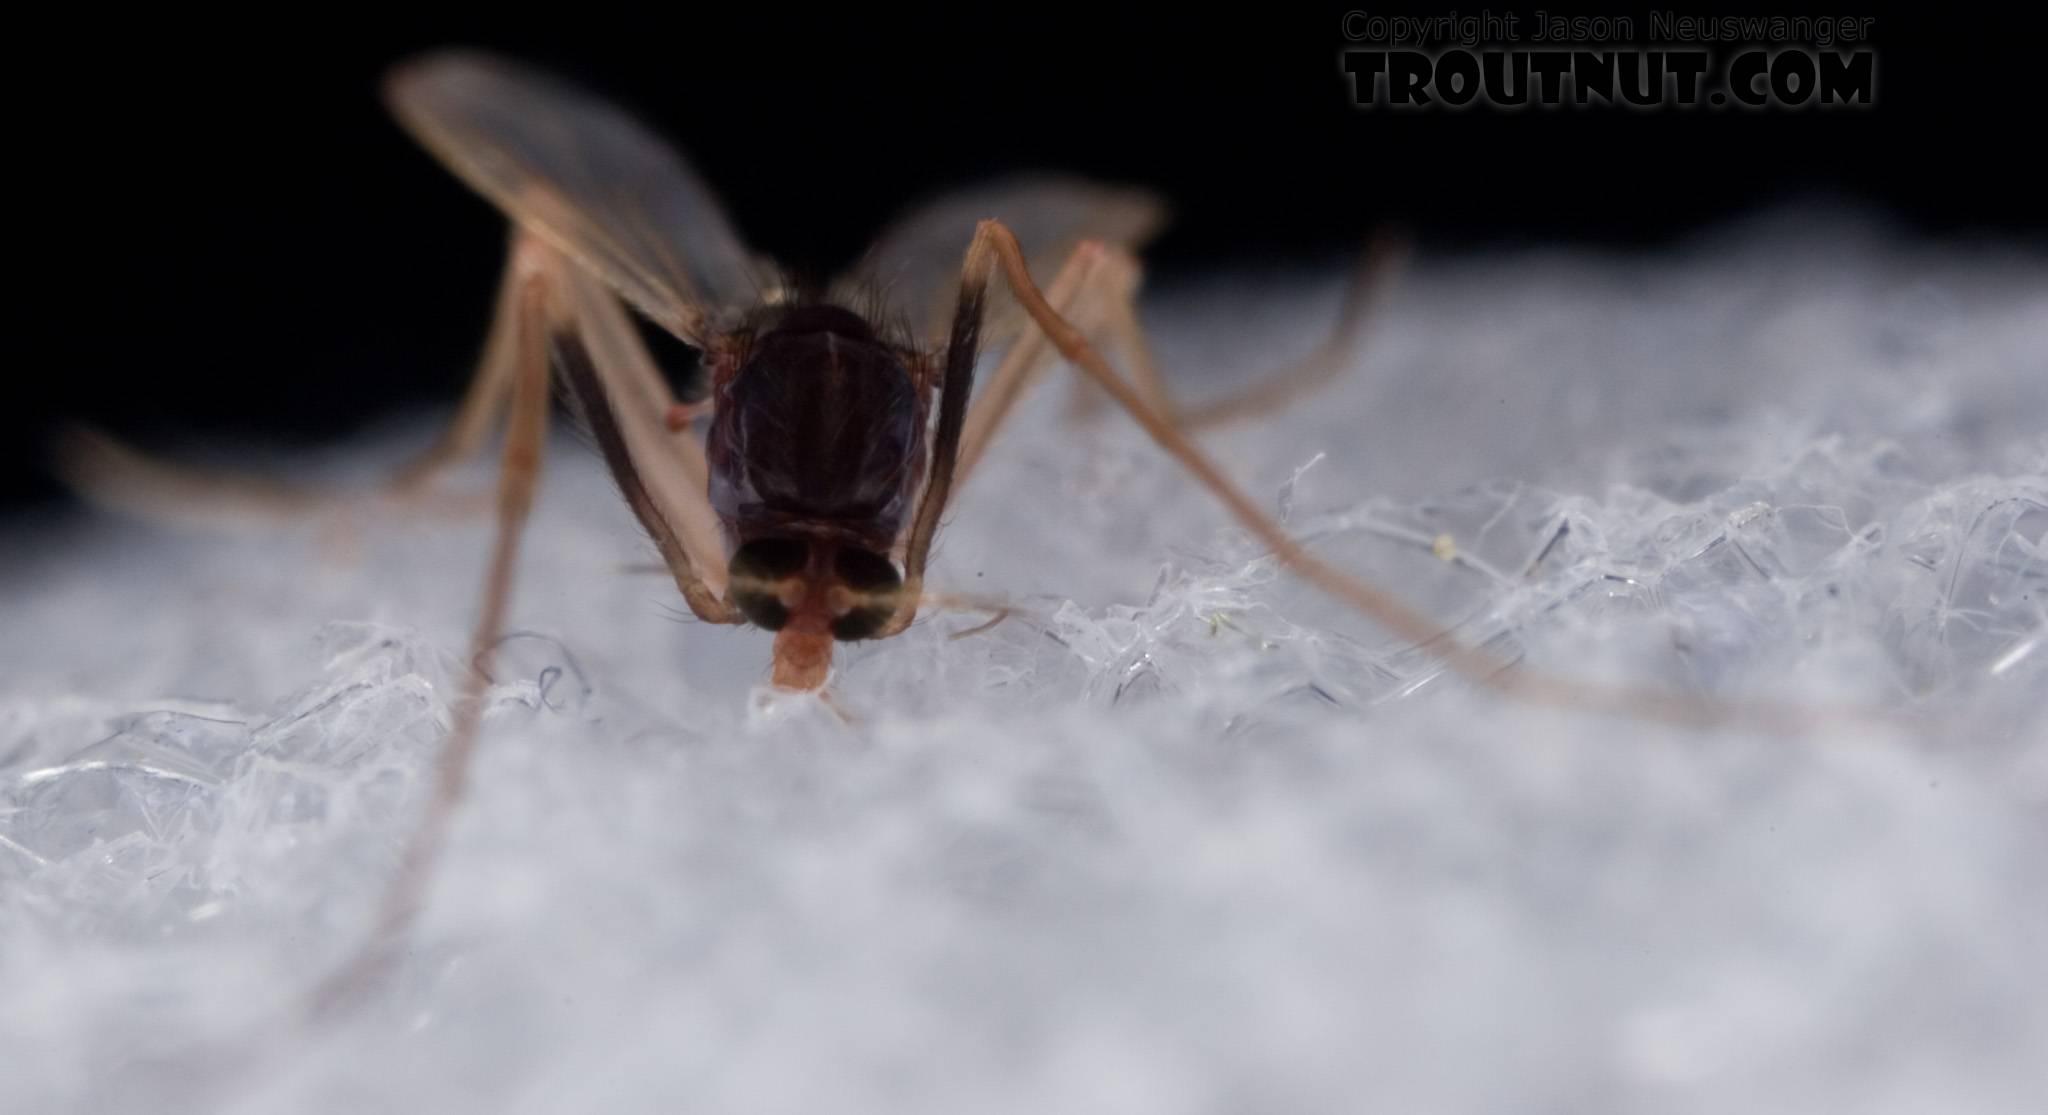 Chironomidae (Midges) Midge Adult from Mystery Creek #62 in New York